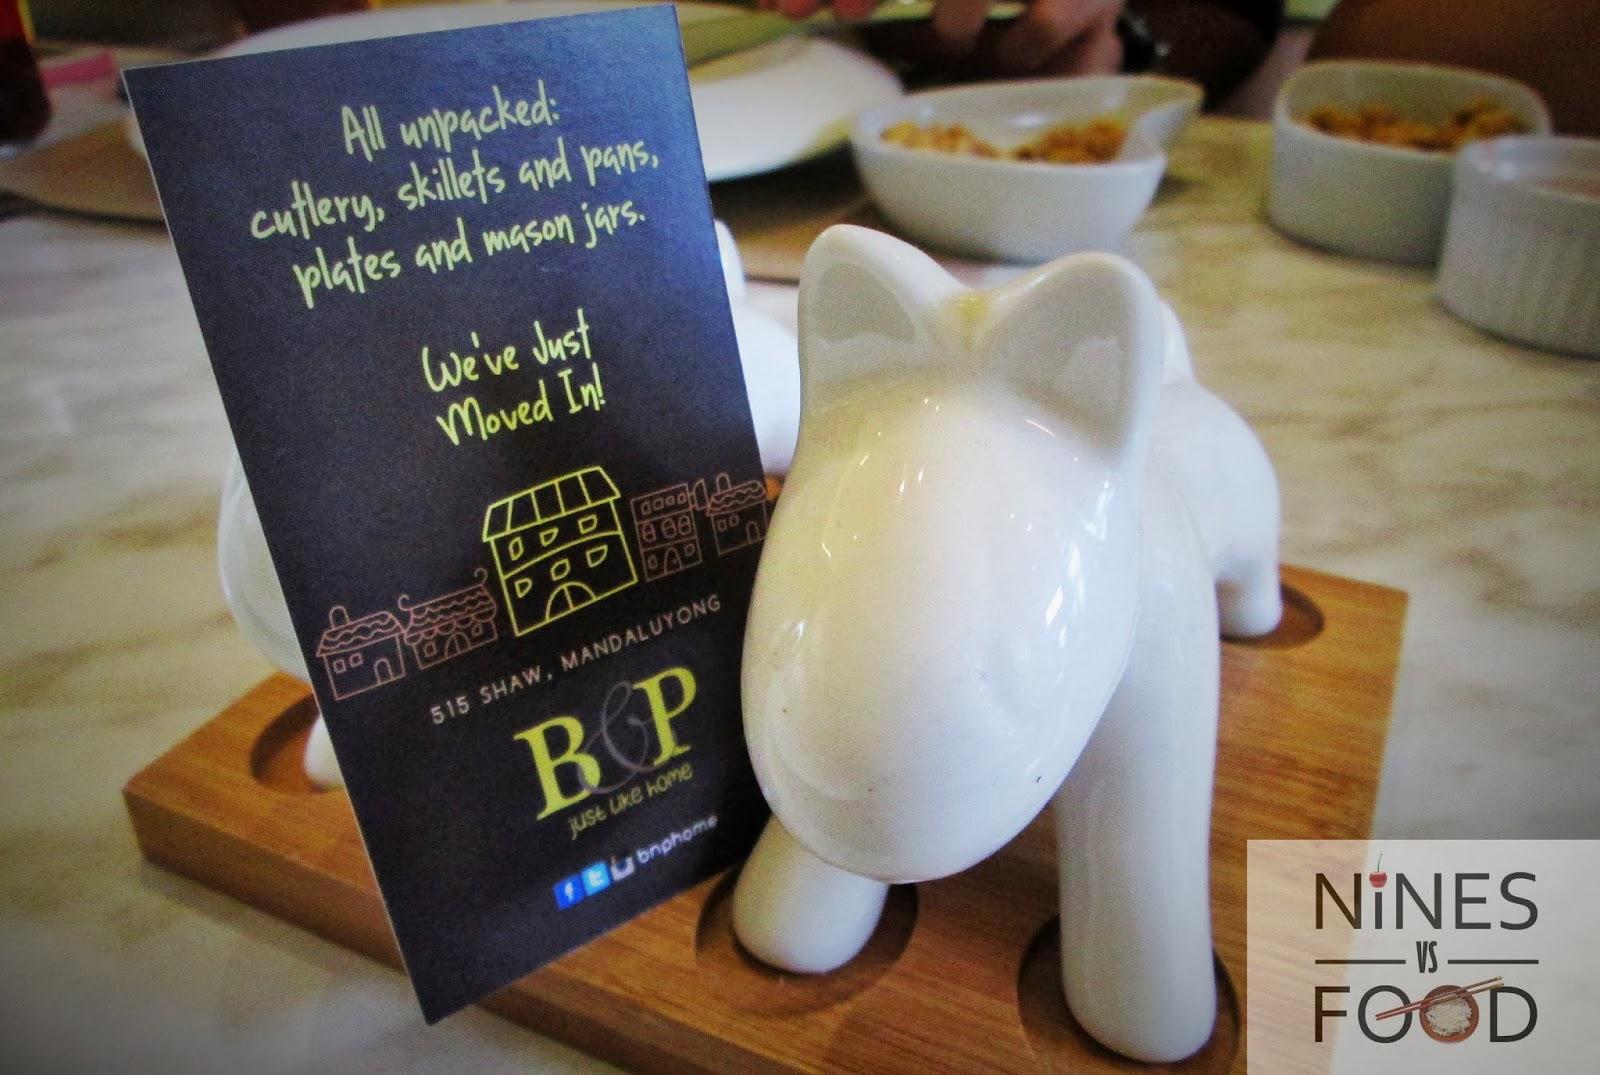 Nines vs. Food - B&P Shaw Mandaluyong-4.jpg